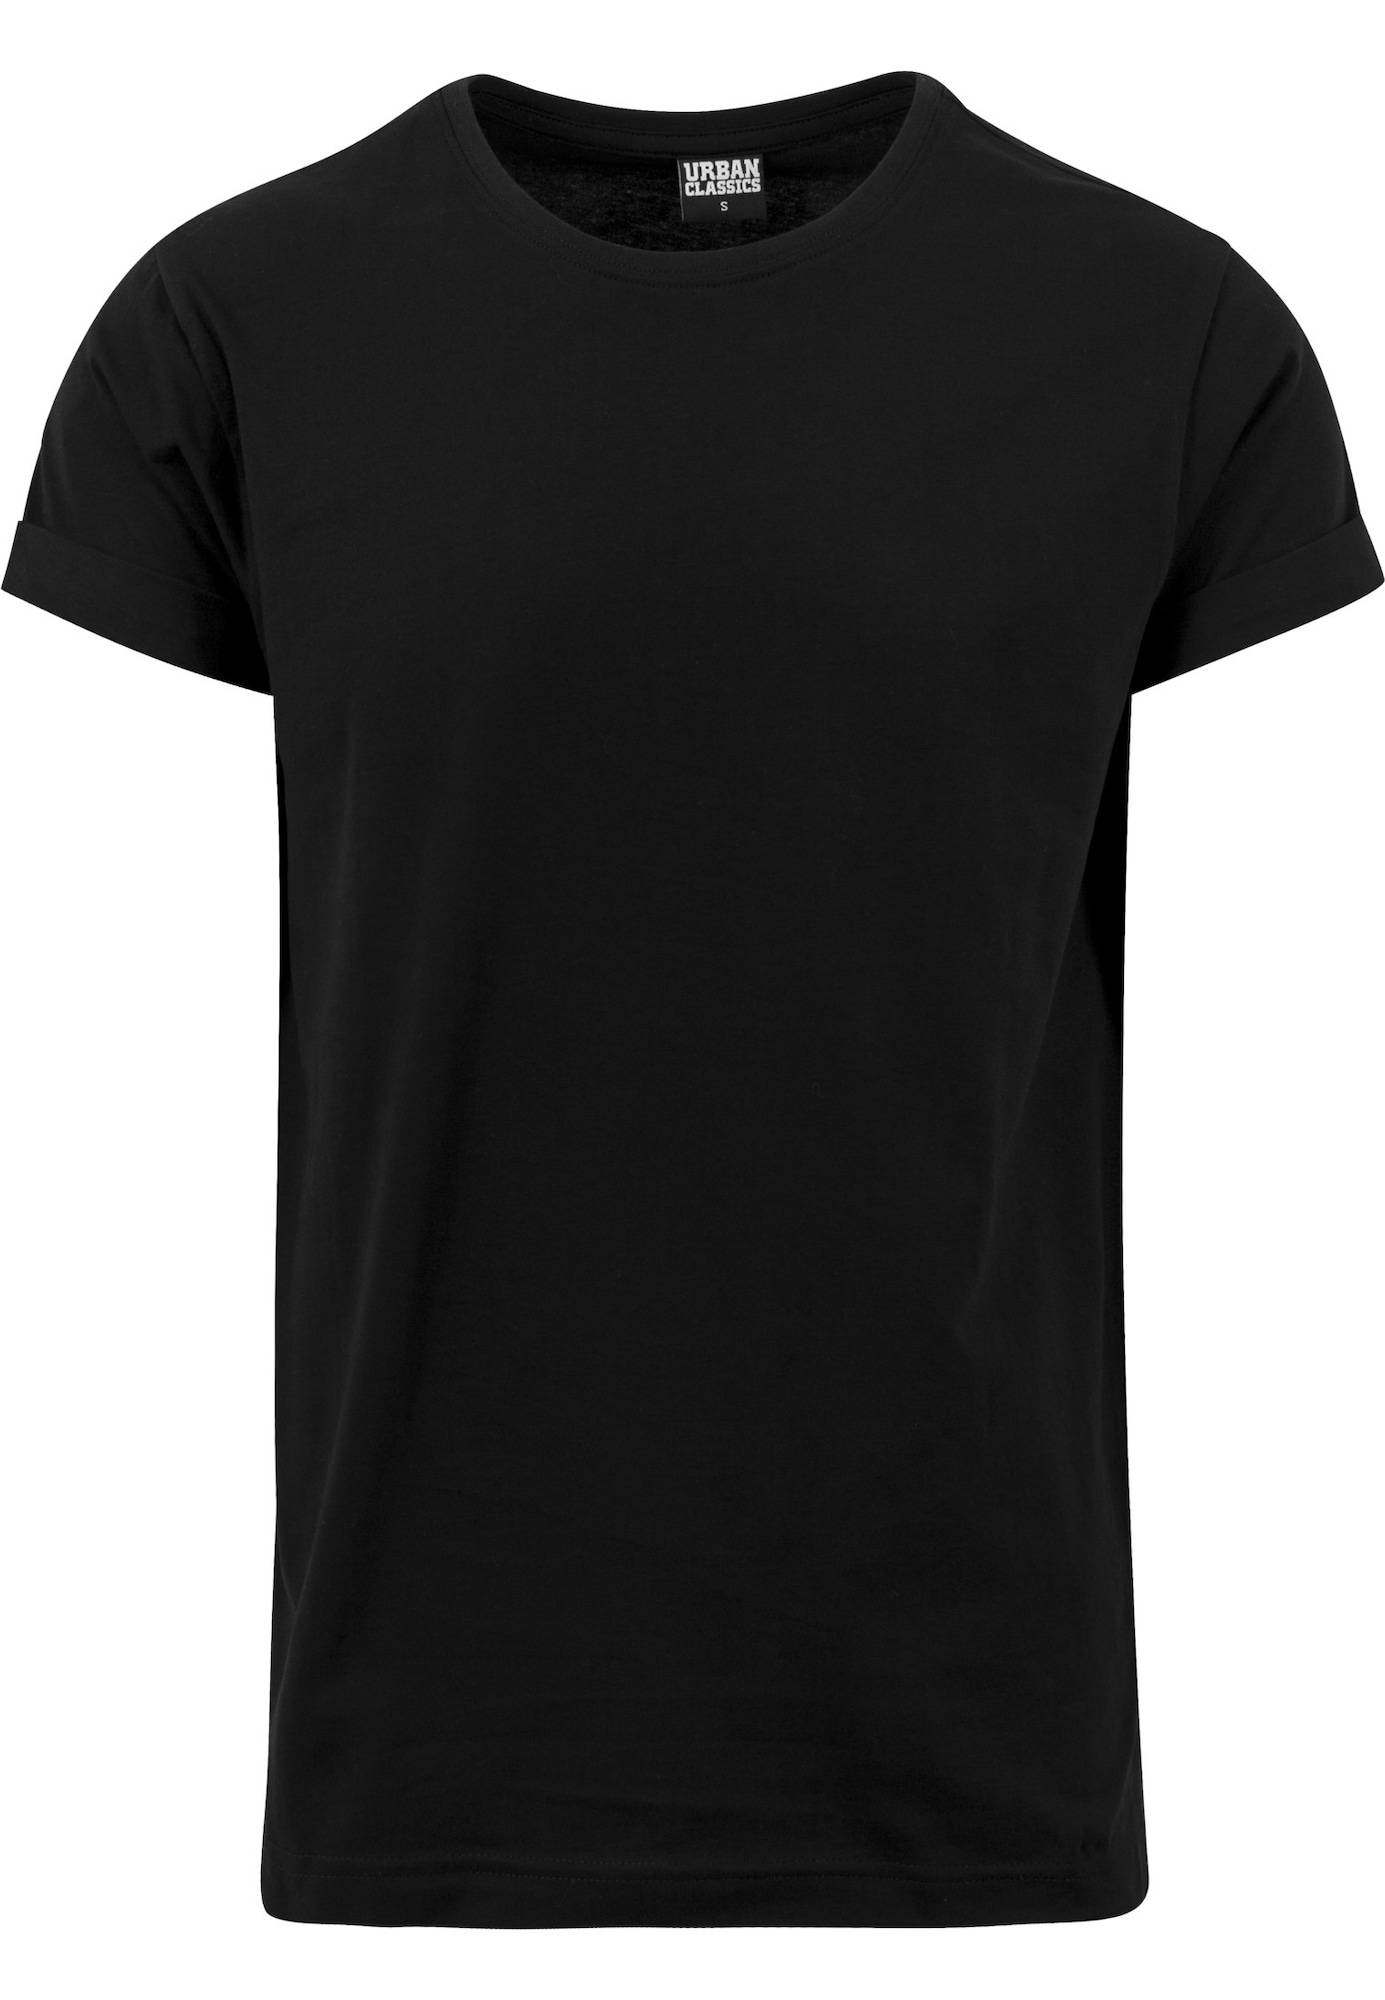 Urban Classics T-Shirt  - Noir - Taille: S - male